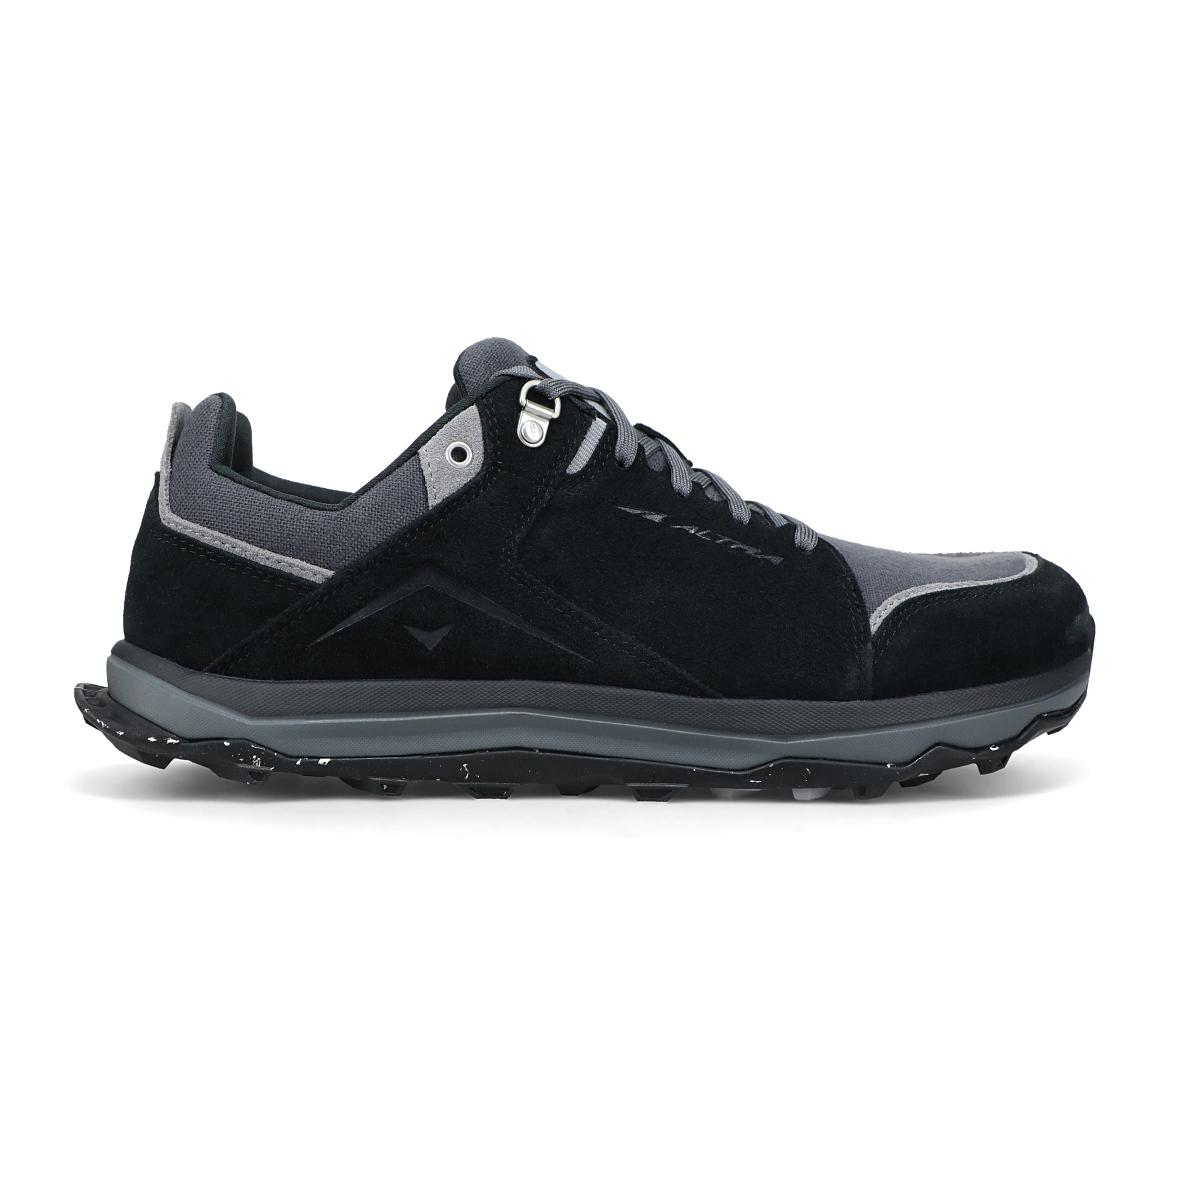 Men's Altra Lone Peak Alpine Trail Running Shoe - Color: Black - Size: 7 - Width: Regular, Black, large, image 1